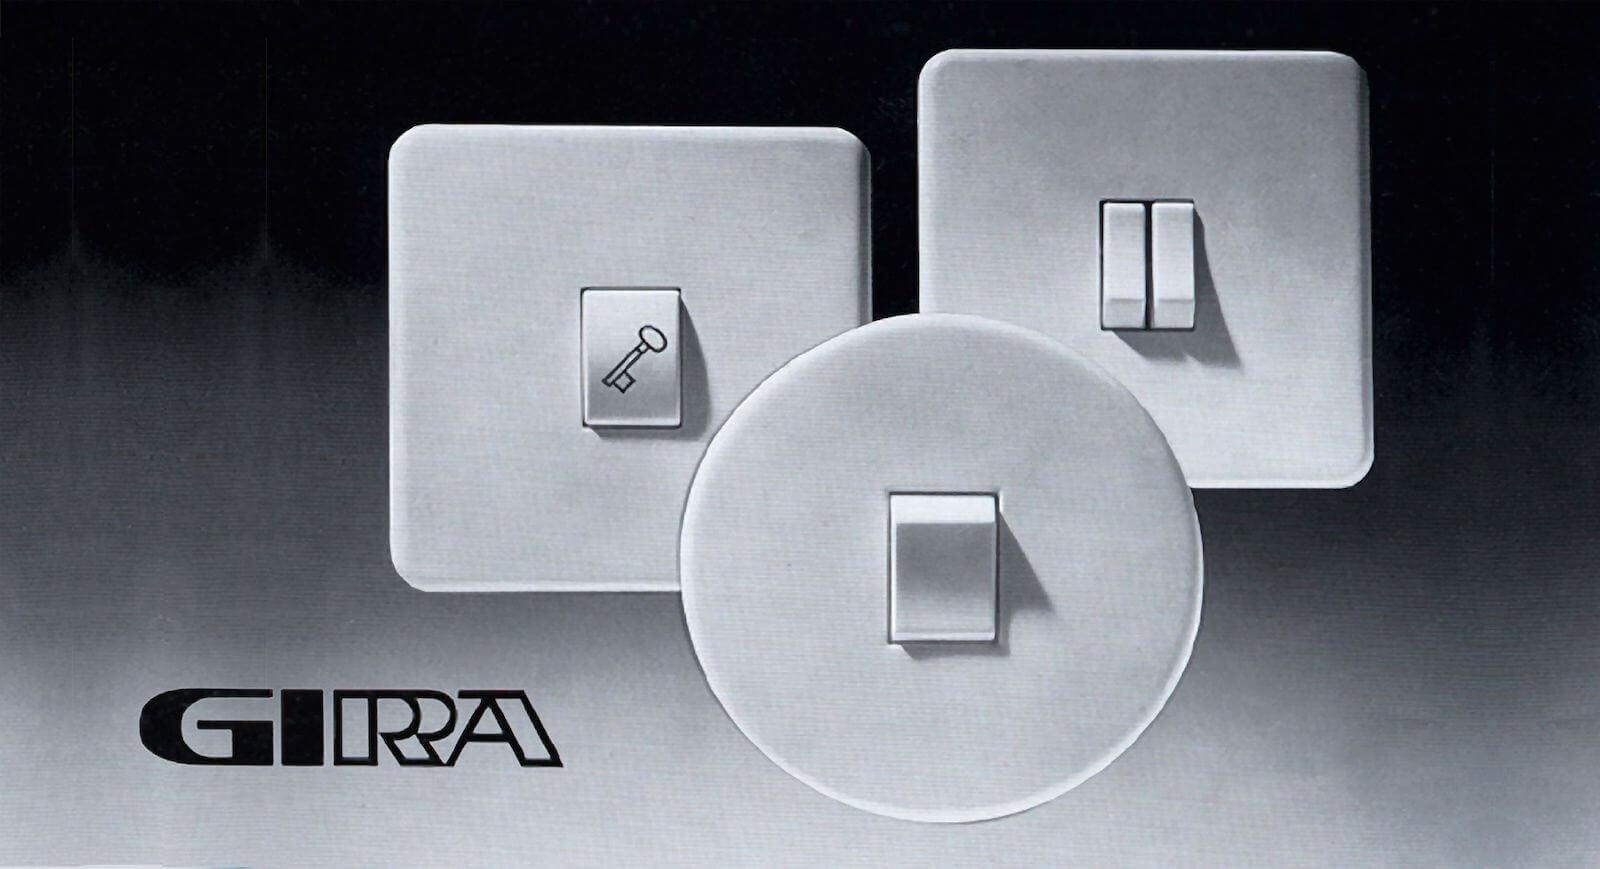 Firmenlogo Gira neben weißen Schalterprogrammen